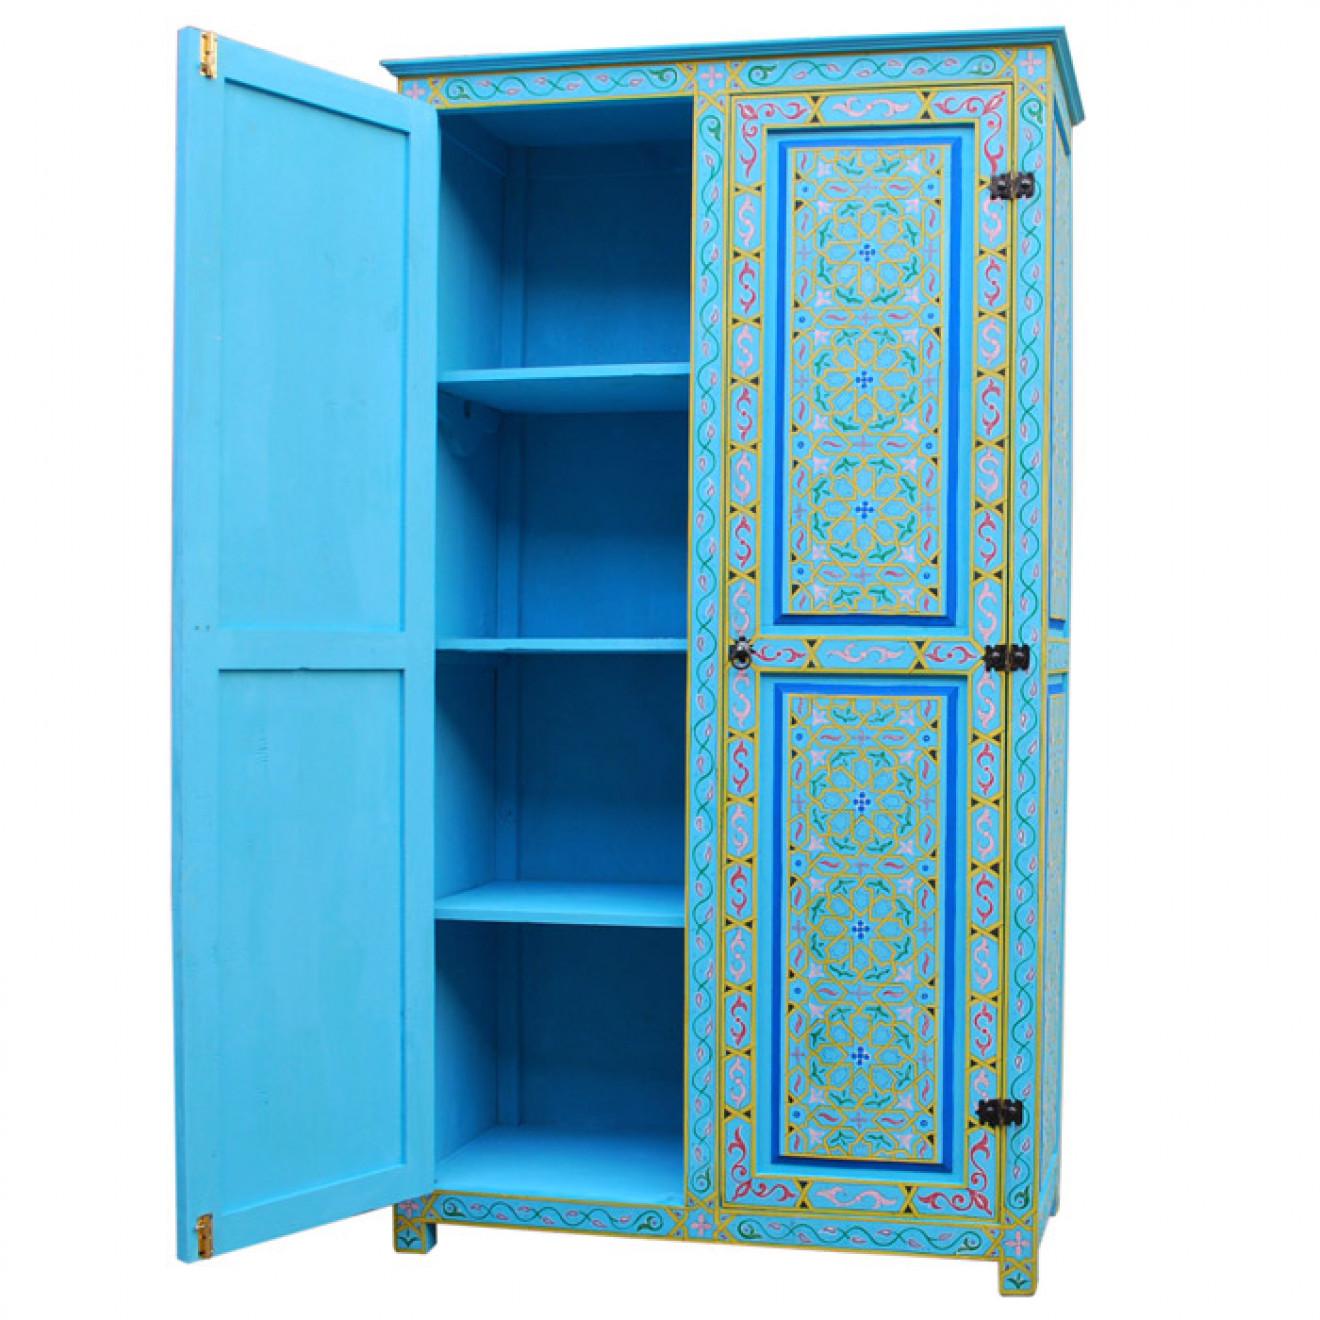 orientalischer holzschrank shibi. Black Bedroom Furniture Sets. Home Design Ideas